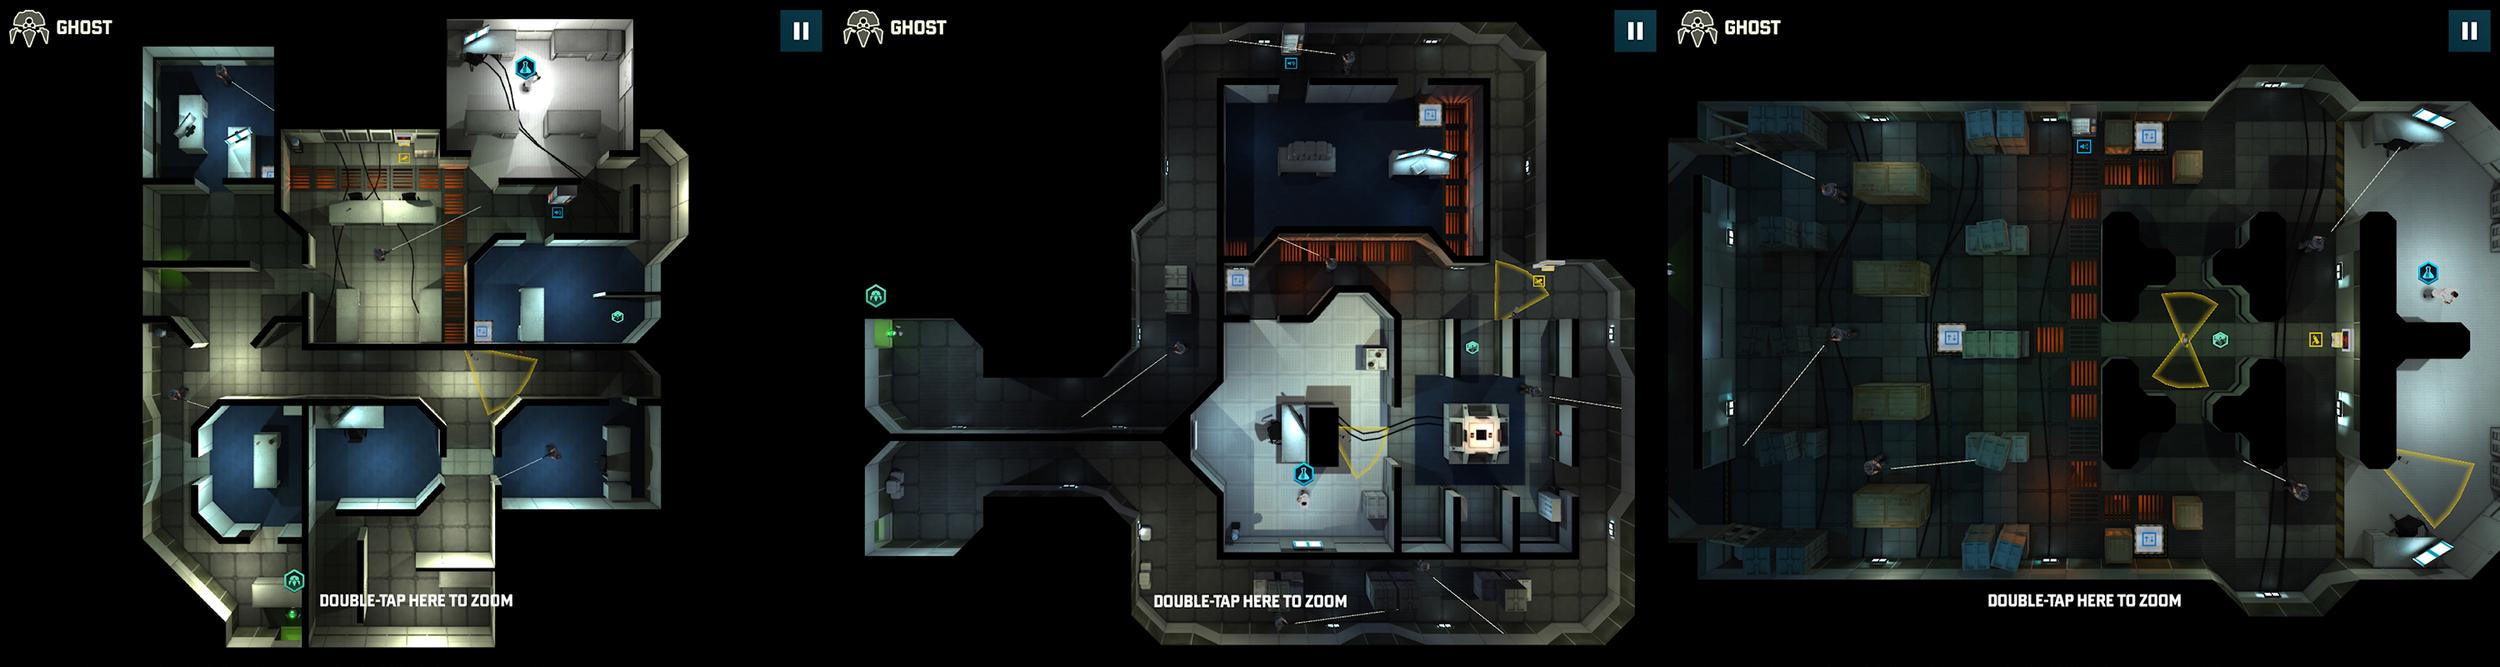 spider-bot-levels-02.png